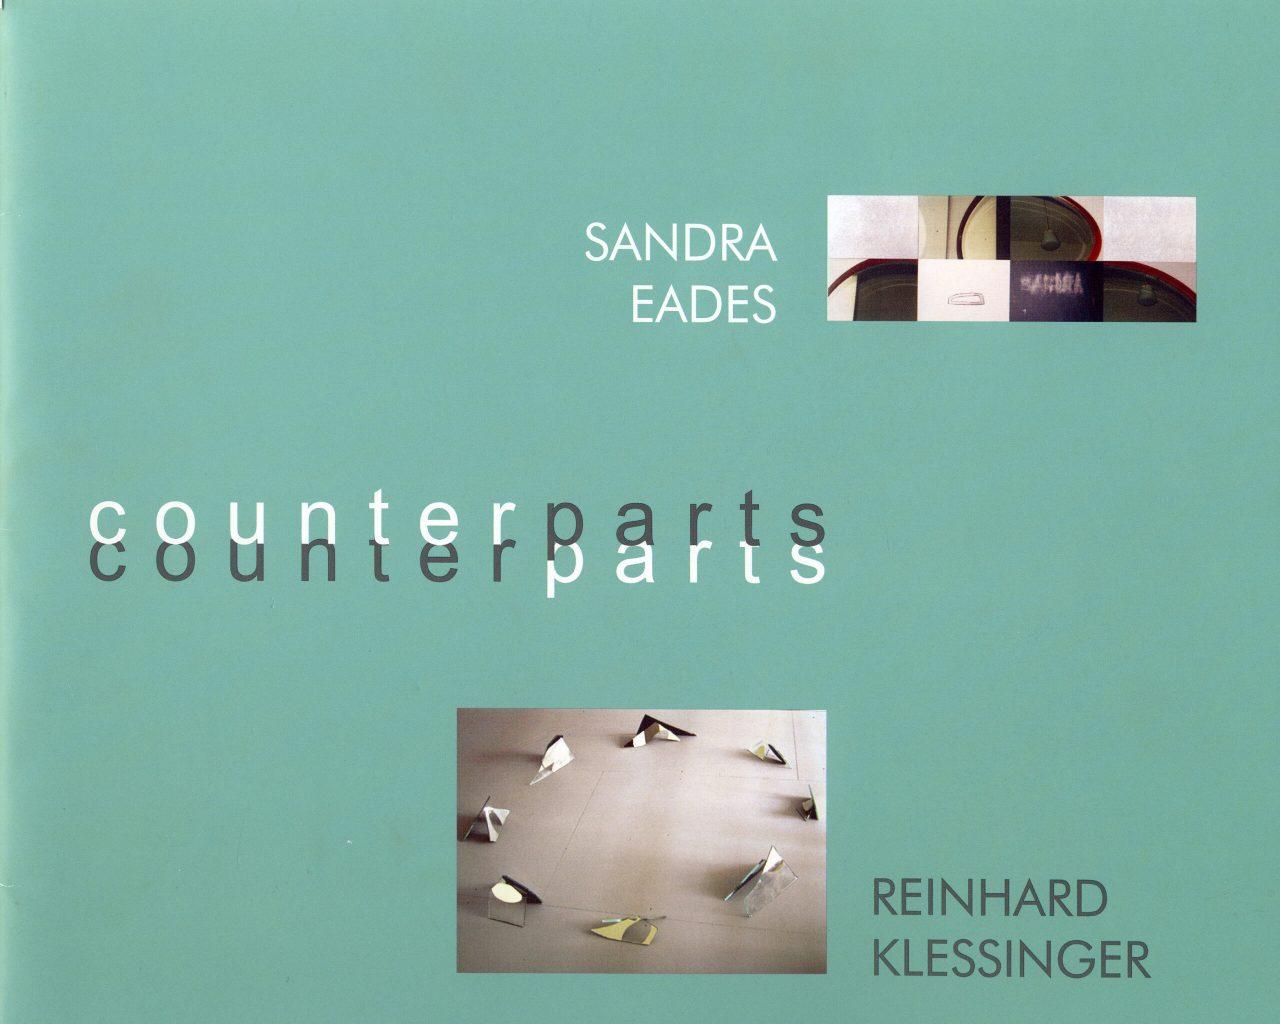 SANDRA EADES & REINHARD KLESSINGER. COUNTERPARTS